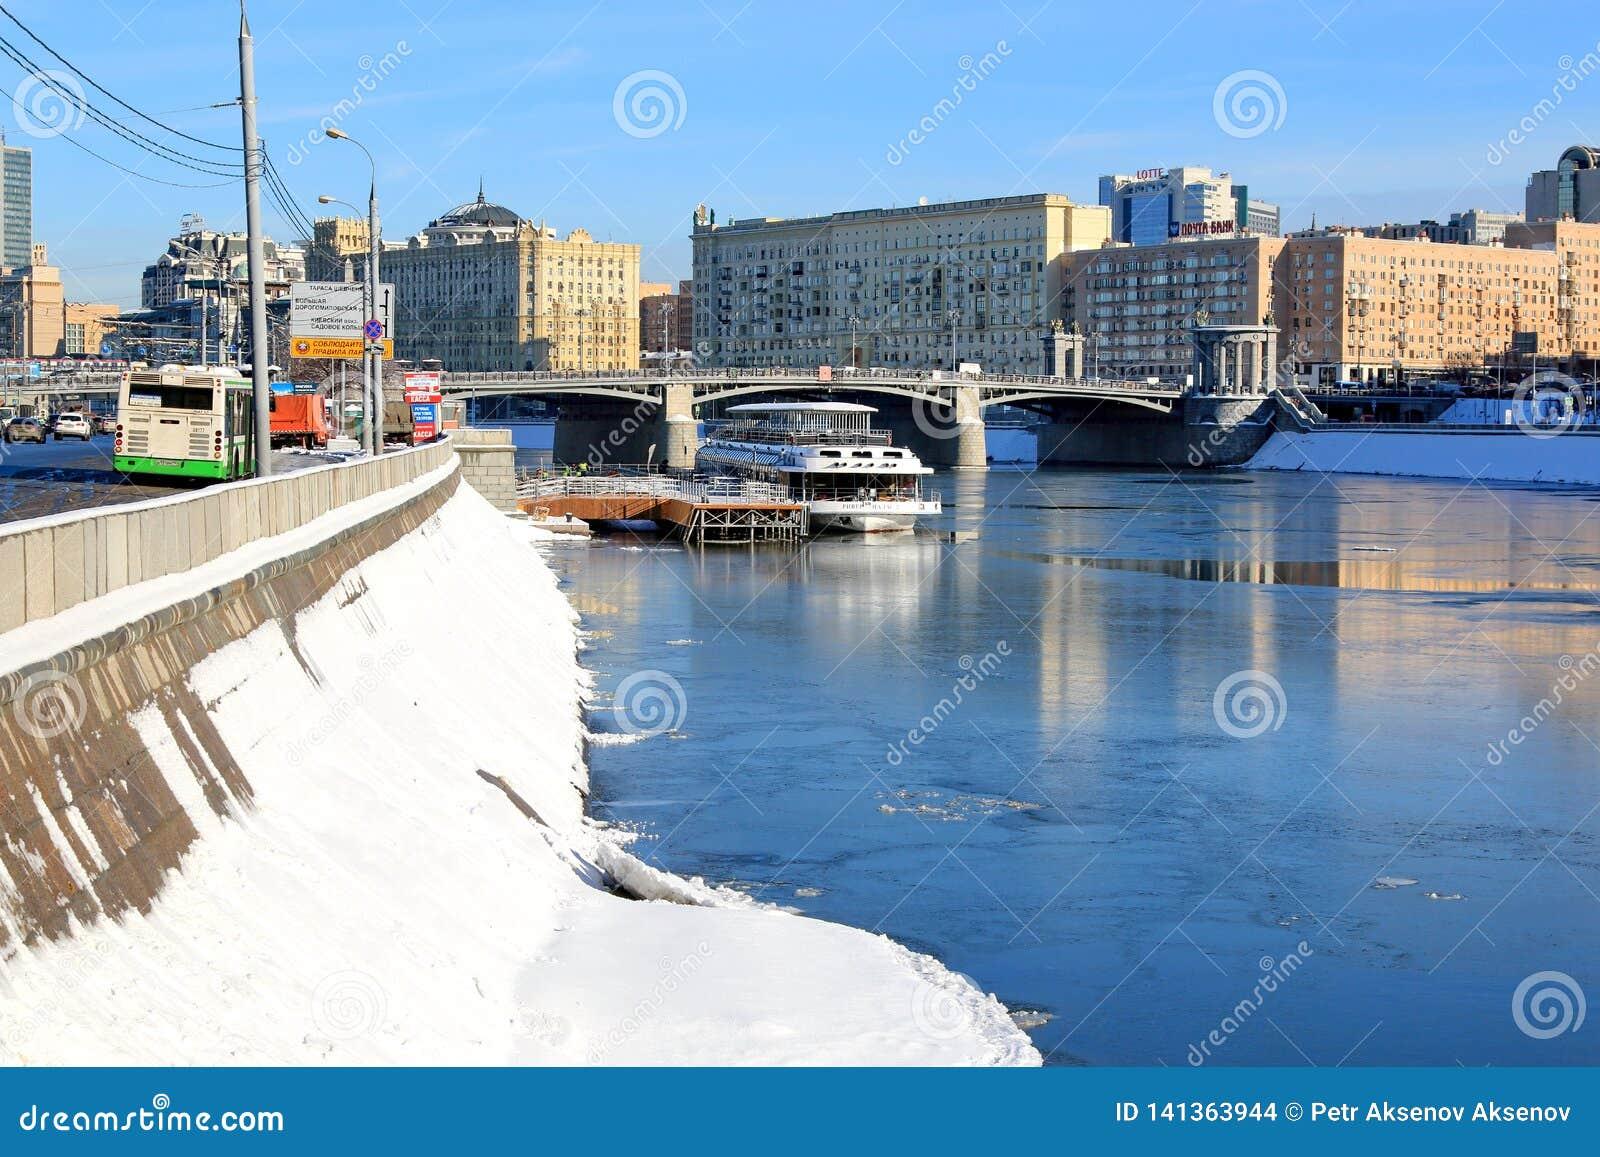 Moscow, Russia - February 14, 2019: Berezhkovskaya Embankment, a pier on the Moskva River and Borodinsky Bridge